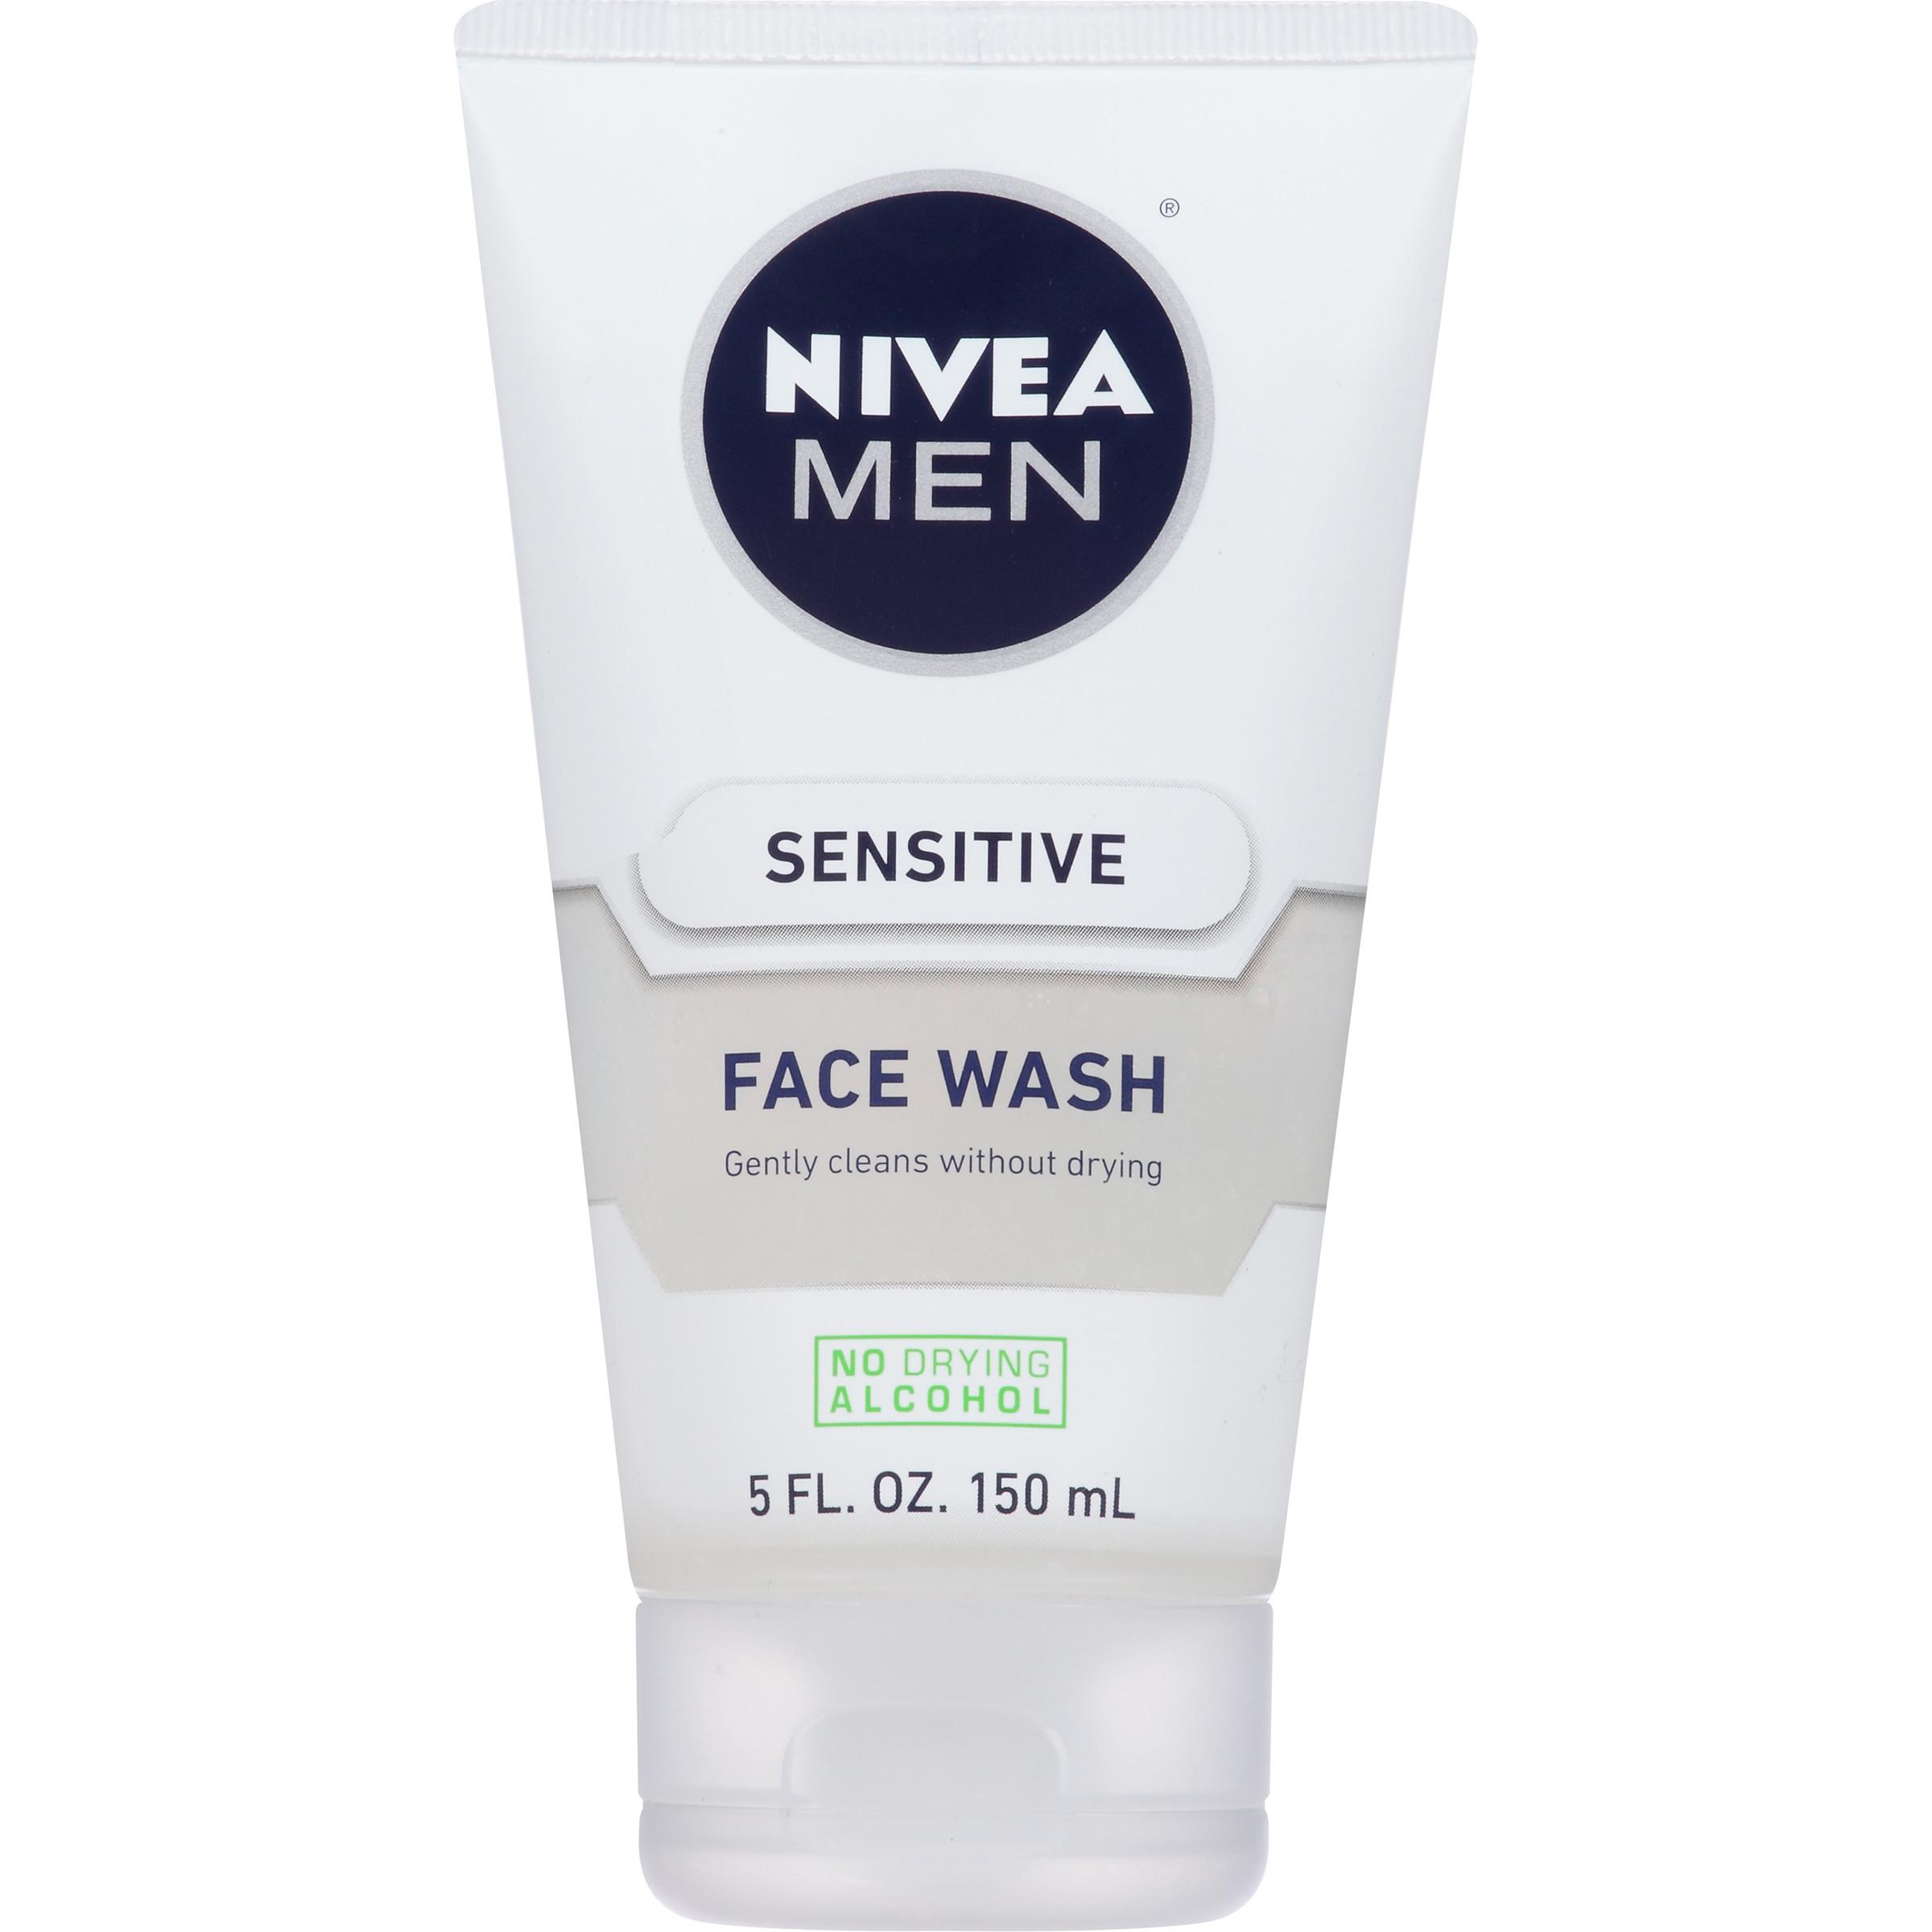 5-oz Nivea Men Sensitive Face Wash $2.63 w/ S&S + Free shipping